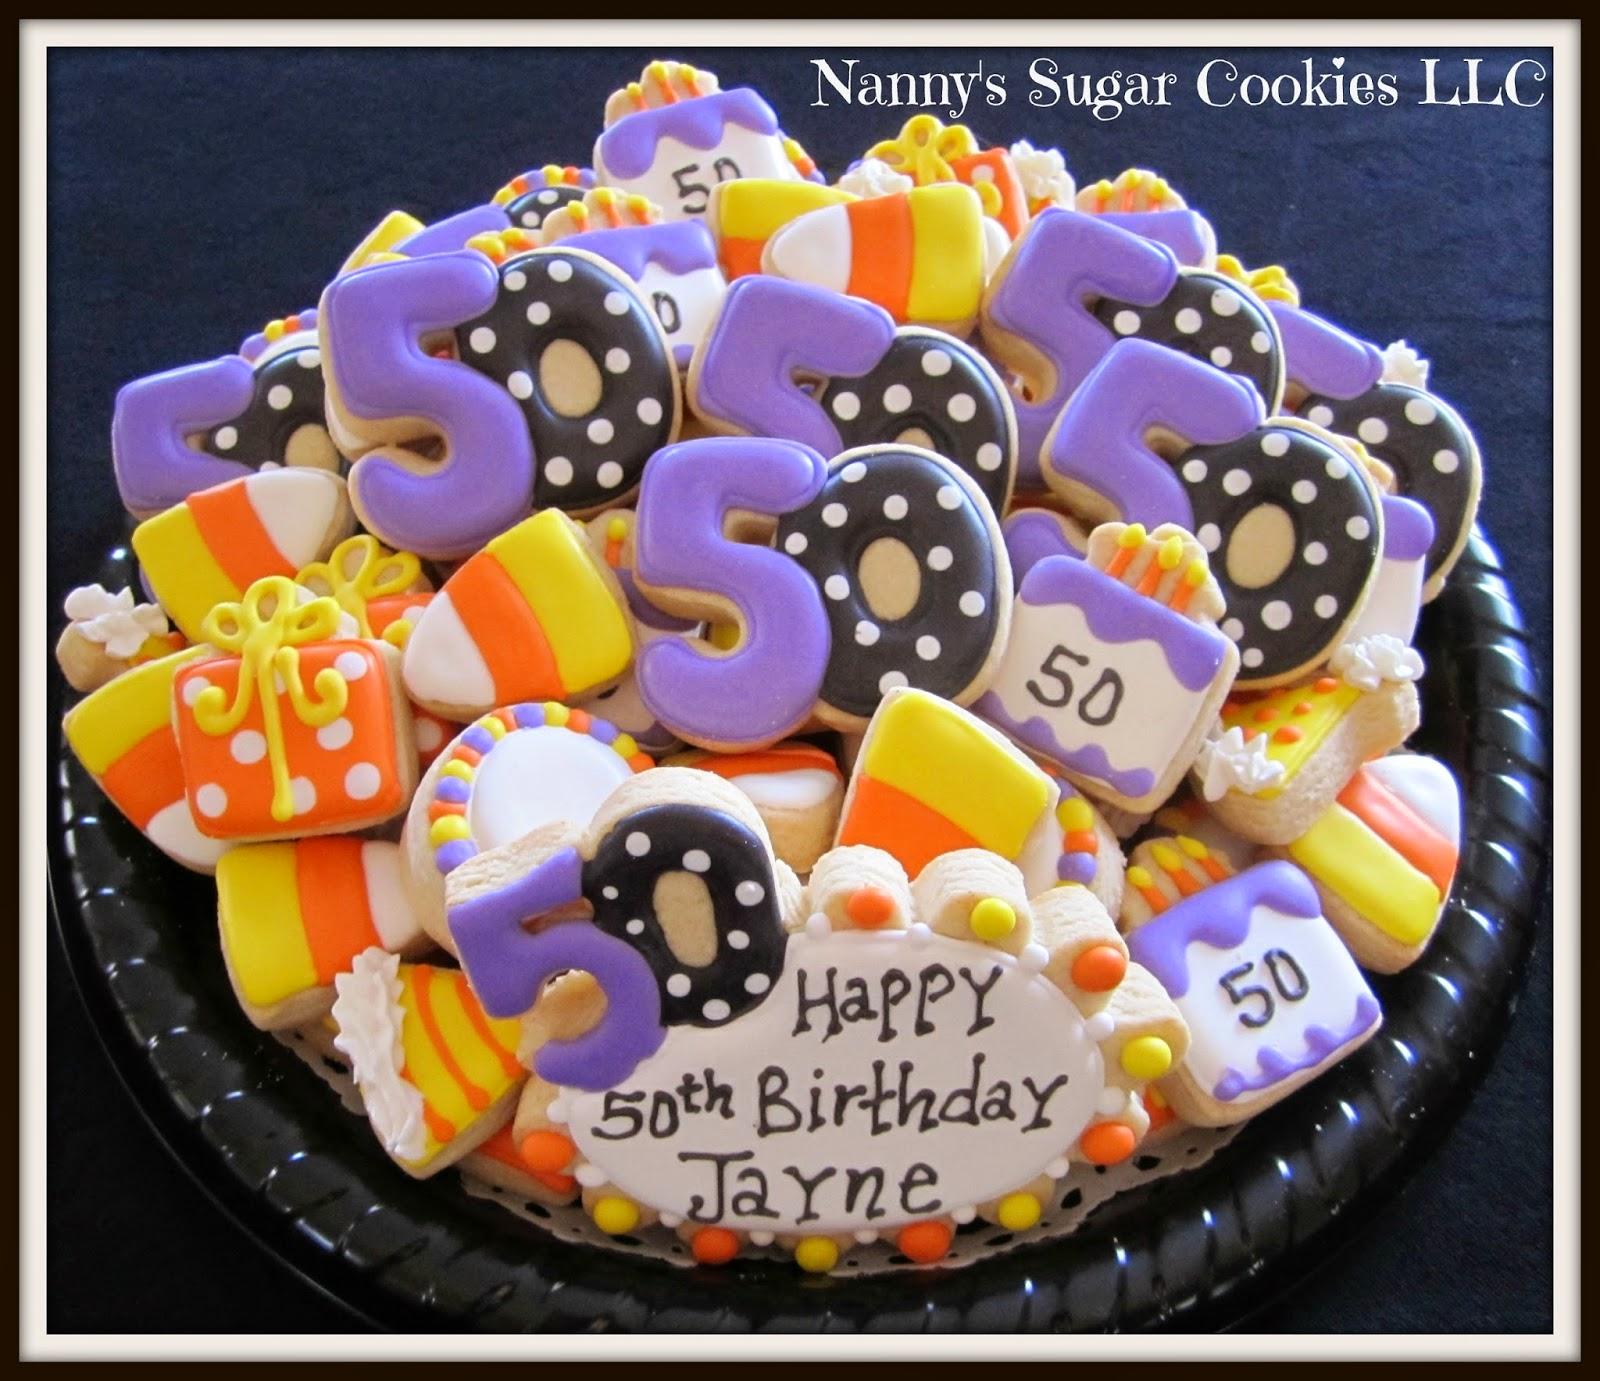 Nanny's Sugar Cookies LLC: 50th Birthday Celebration